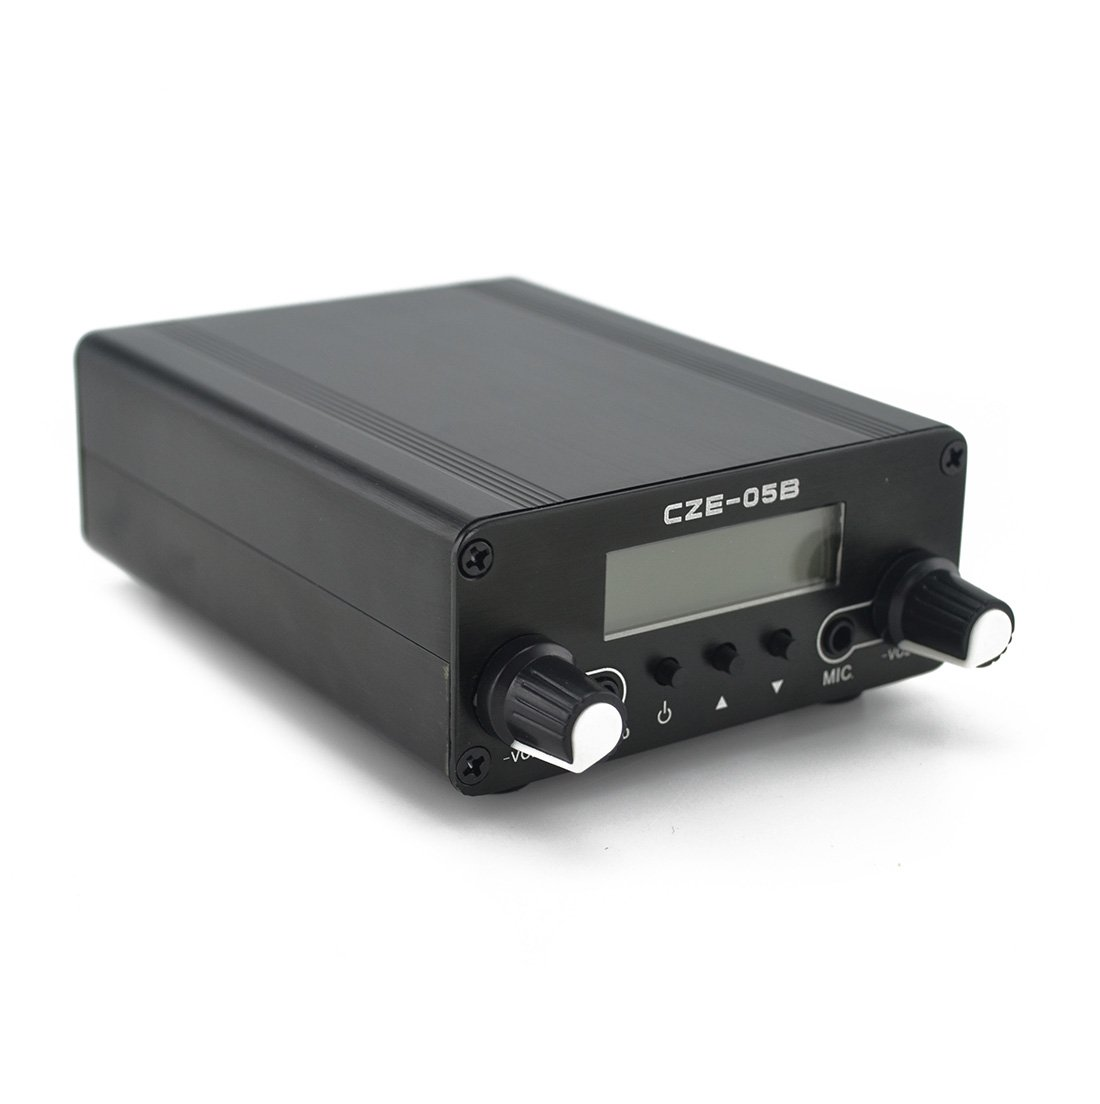 Samyo 05w Wireless Long Range Stereo Broadcast Fm Also Lifier Circuit Transmitter Dual Mode Black Electronics